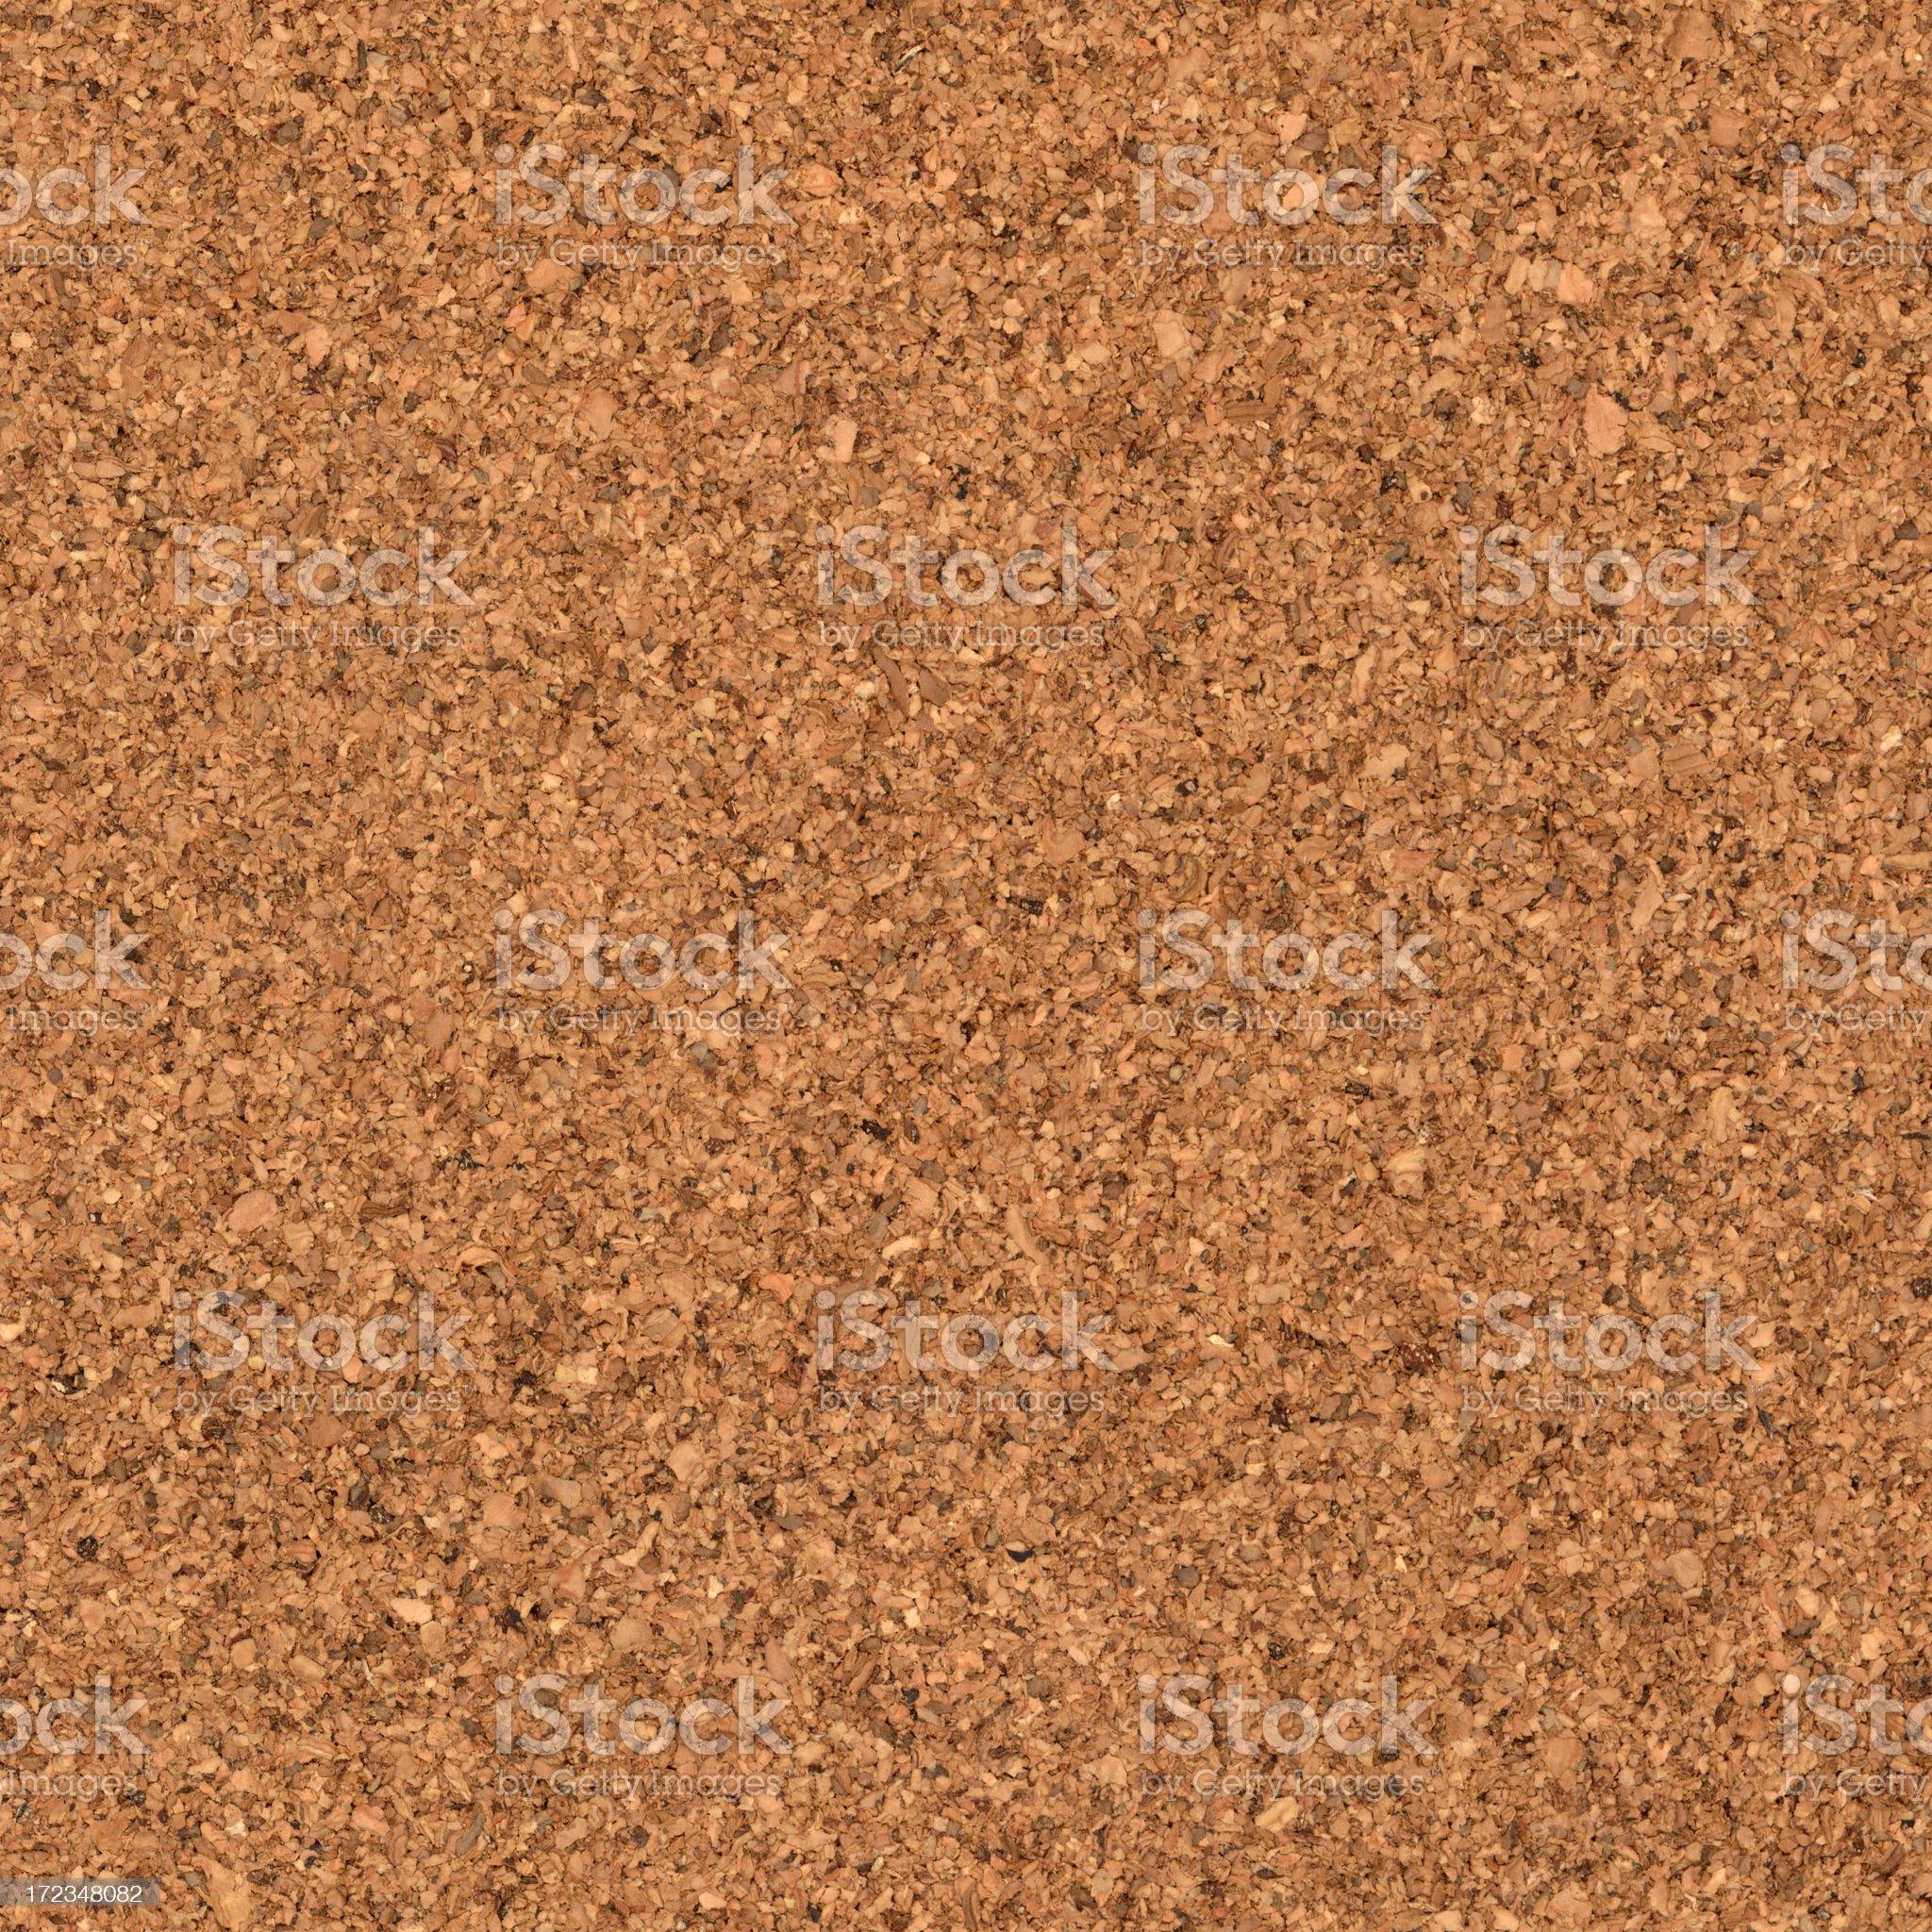 cork square royalty-free stock photo